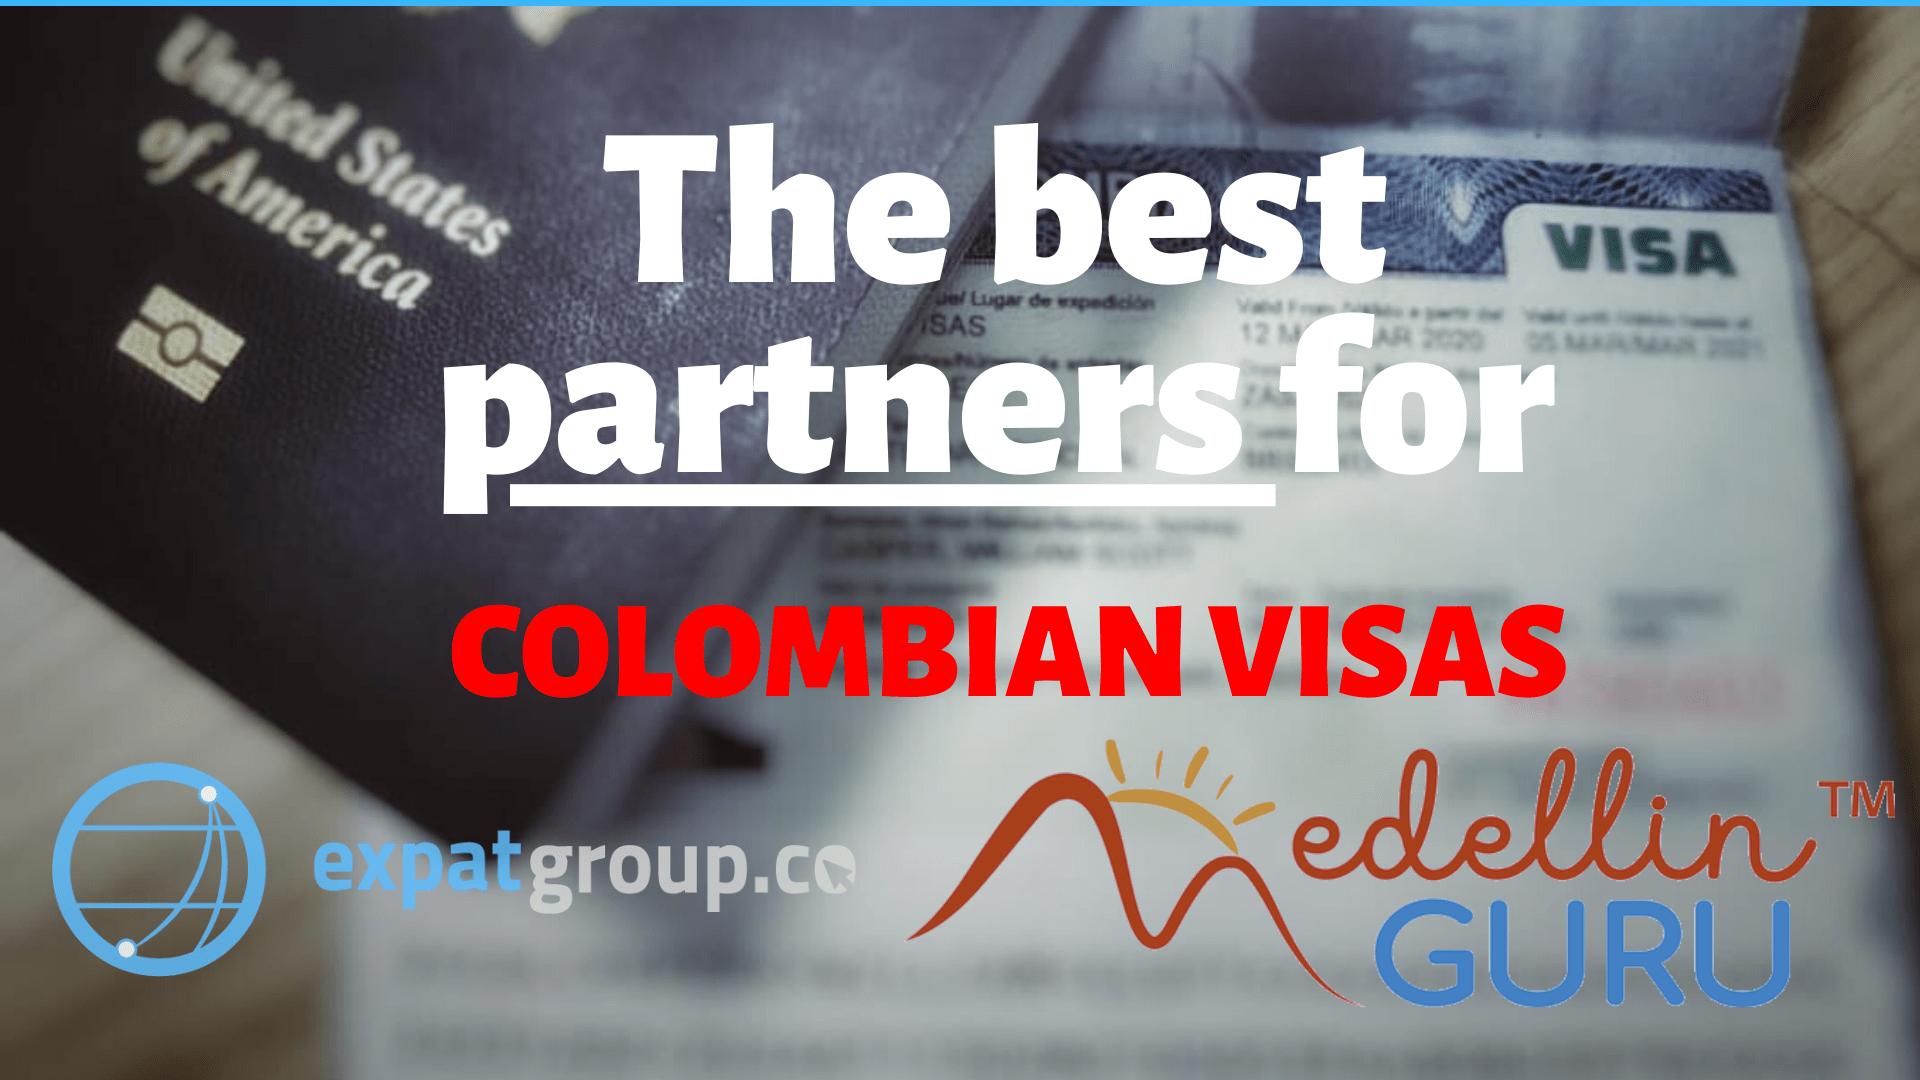 Expatgroup.co,the official Colombian visa partner for Medellín Guru